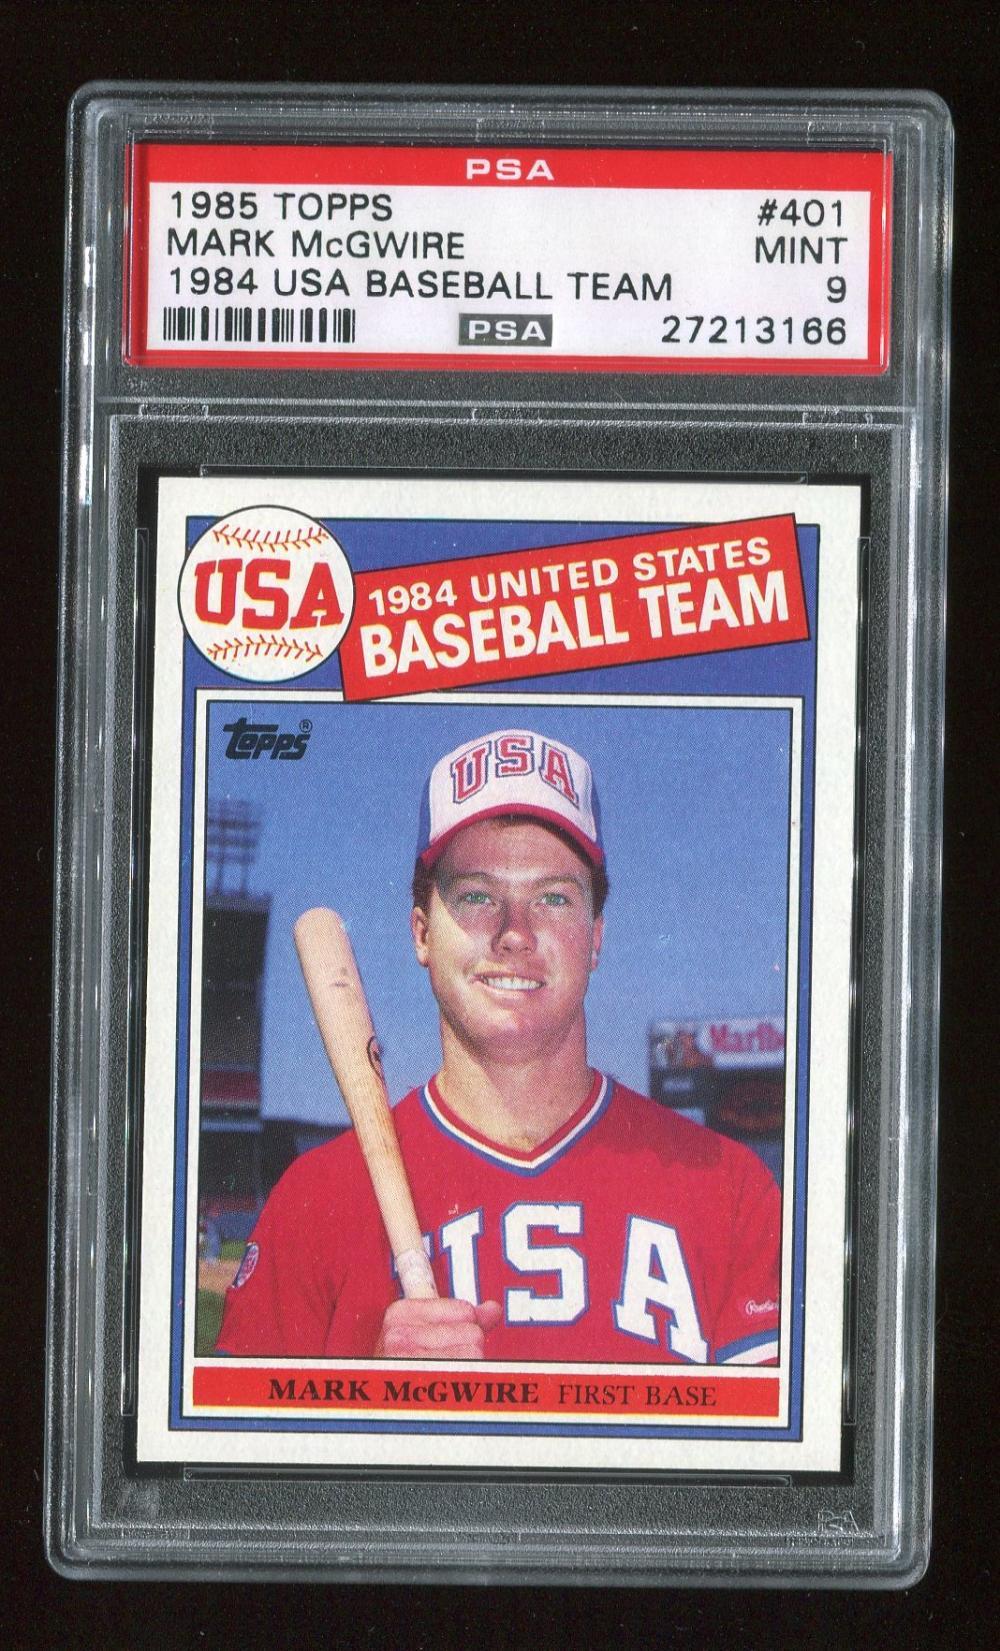 1985 Topps Mark Mcgwire 1984 Usa Baseball Team 401 Psa 9 Mint